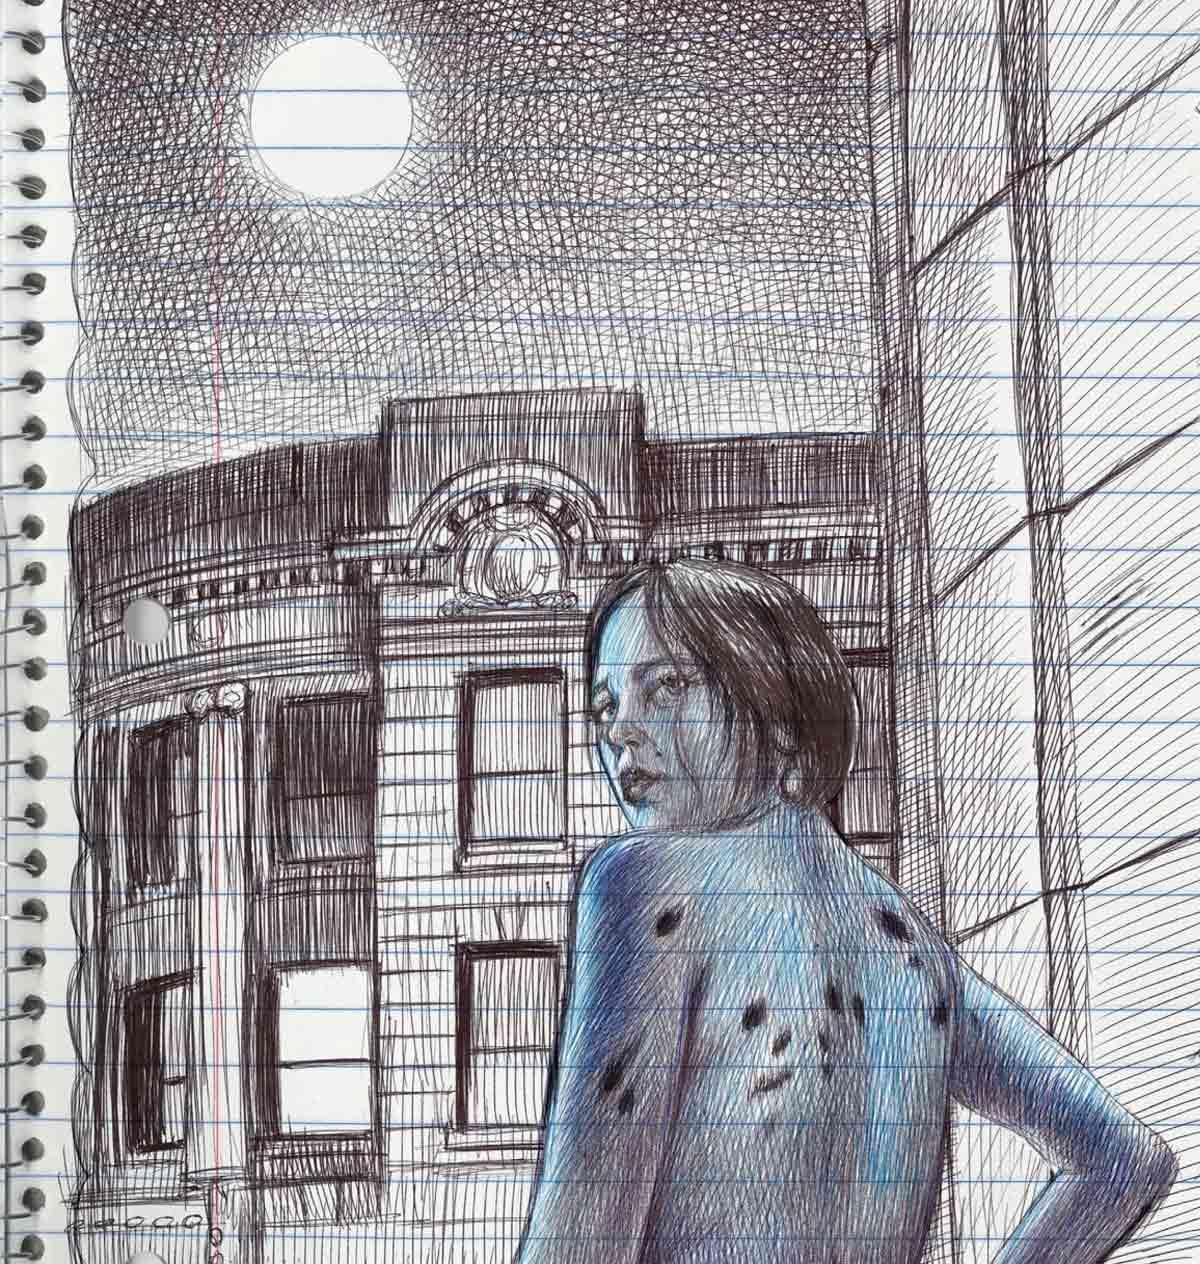 Golem-Comics-comic-Lo-que-mas-me-gusta-son-los-Monstruos-Emil-ferris-04